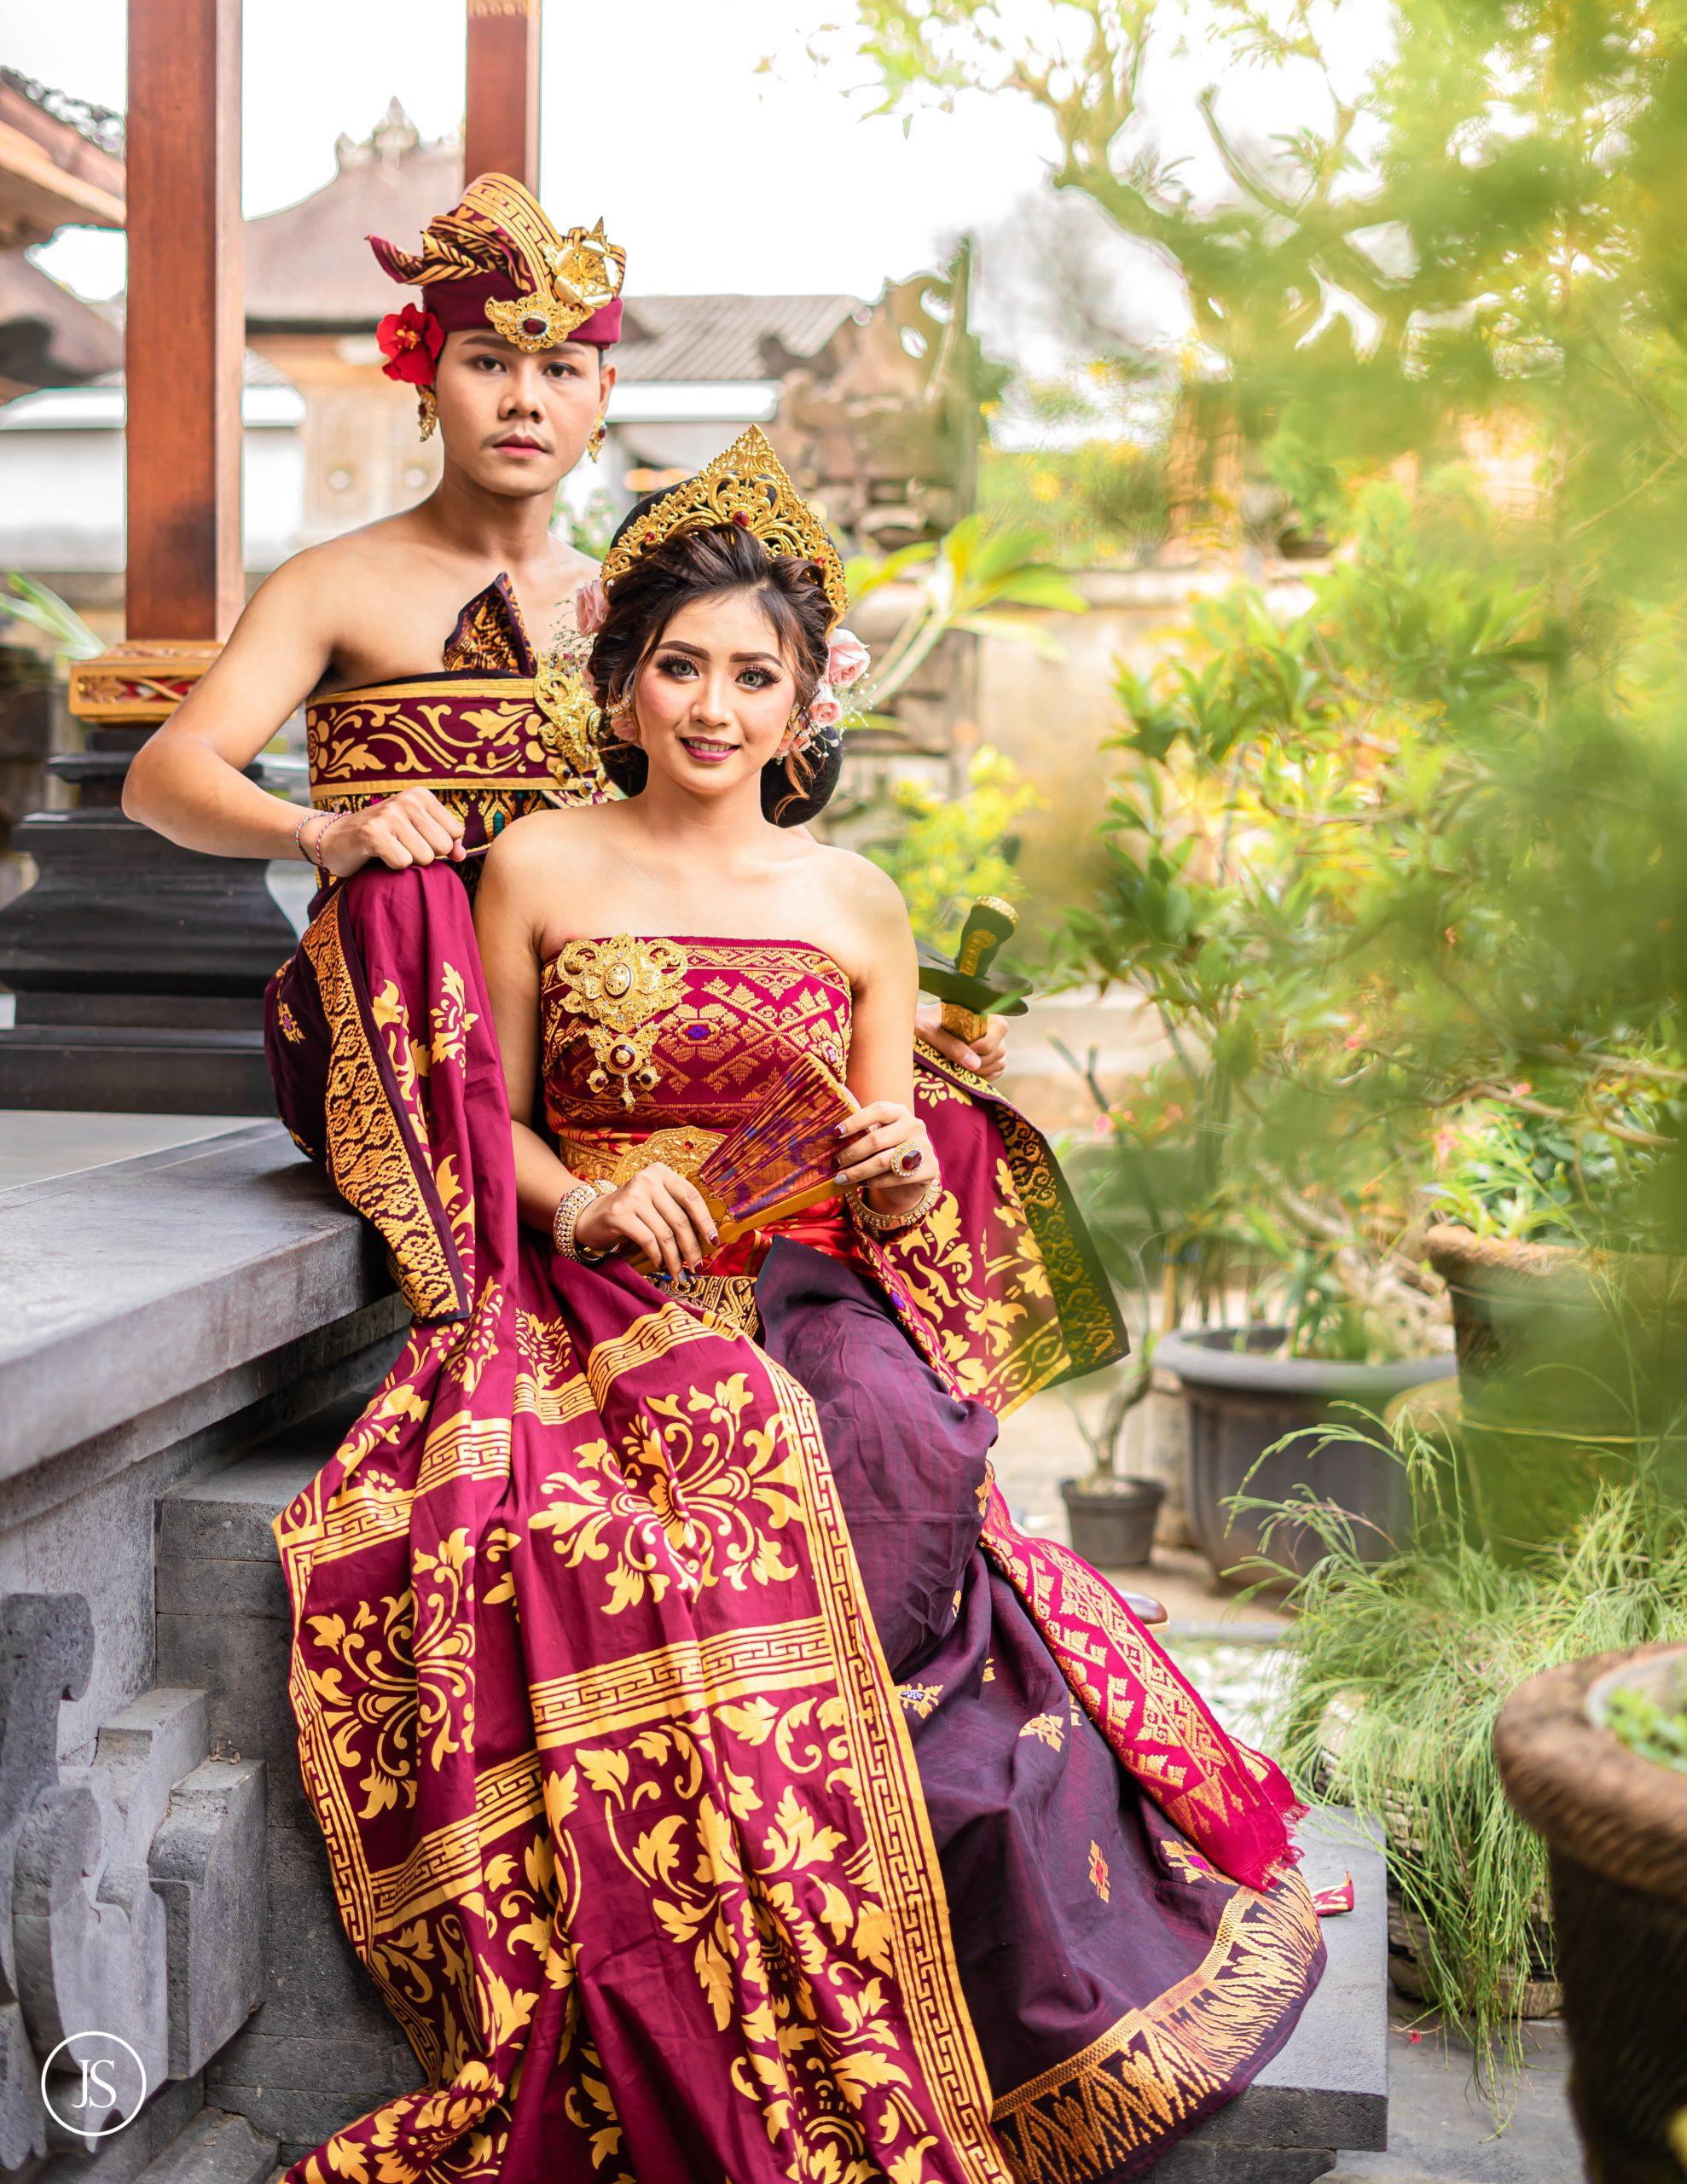 Harga Prewedding Bali Murah